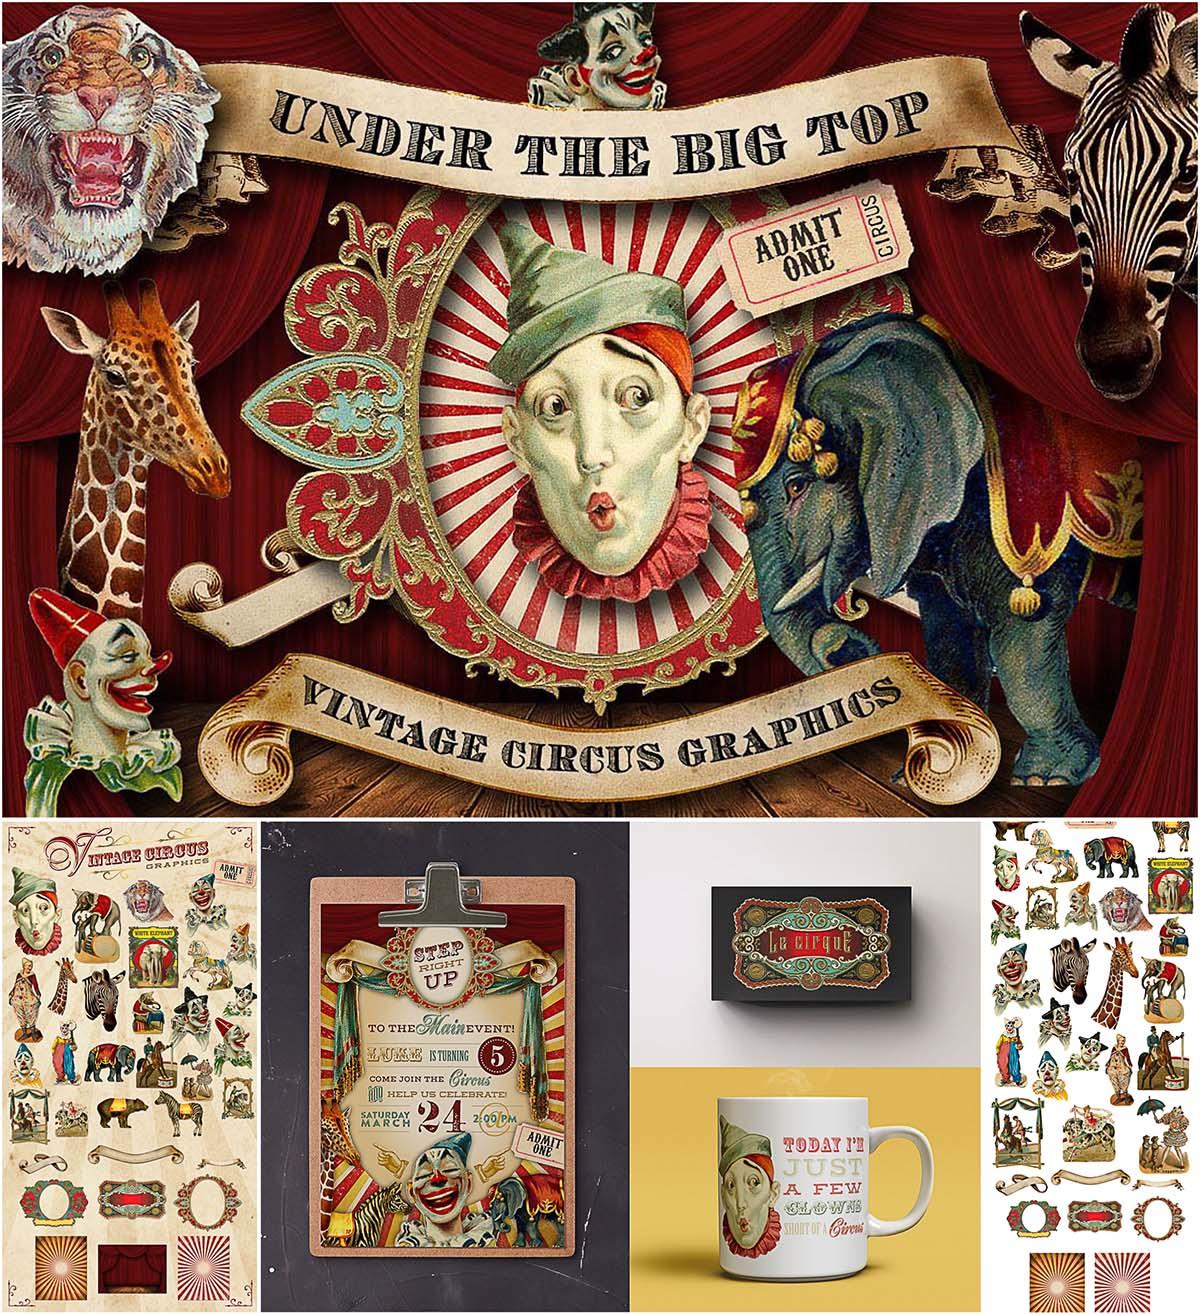 Vintage circus graphics